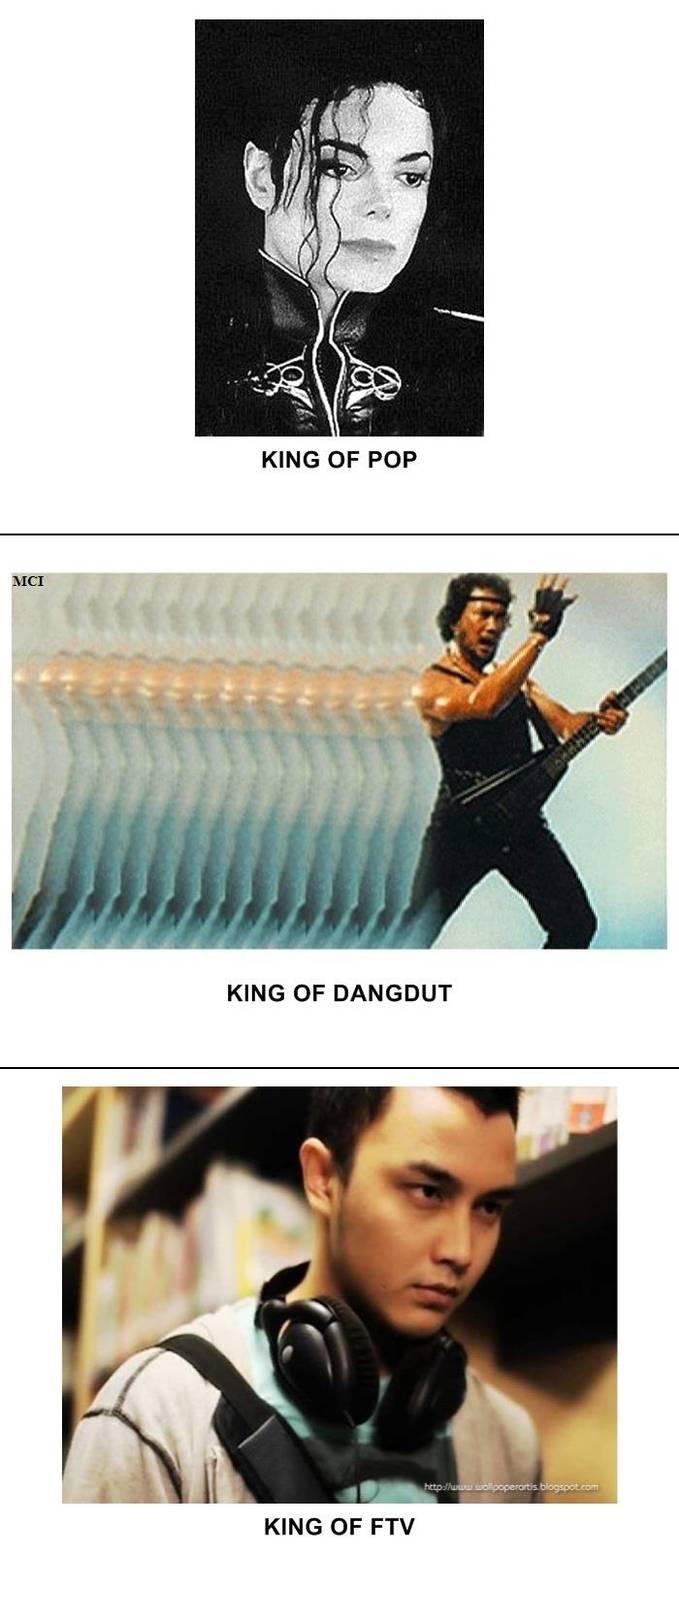 King of FTV karena setiap gue ngeliat FTV yang maen pasti die